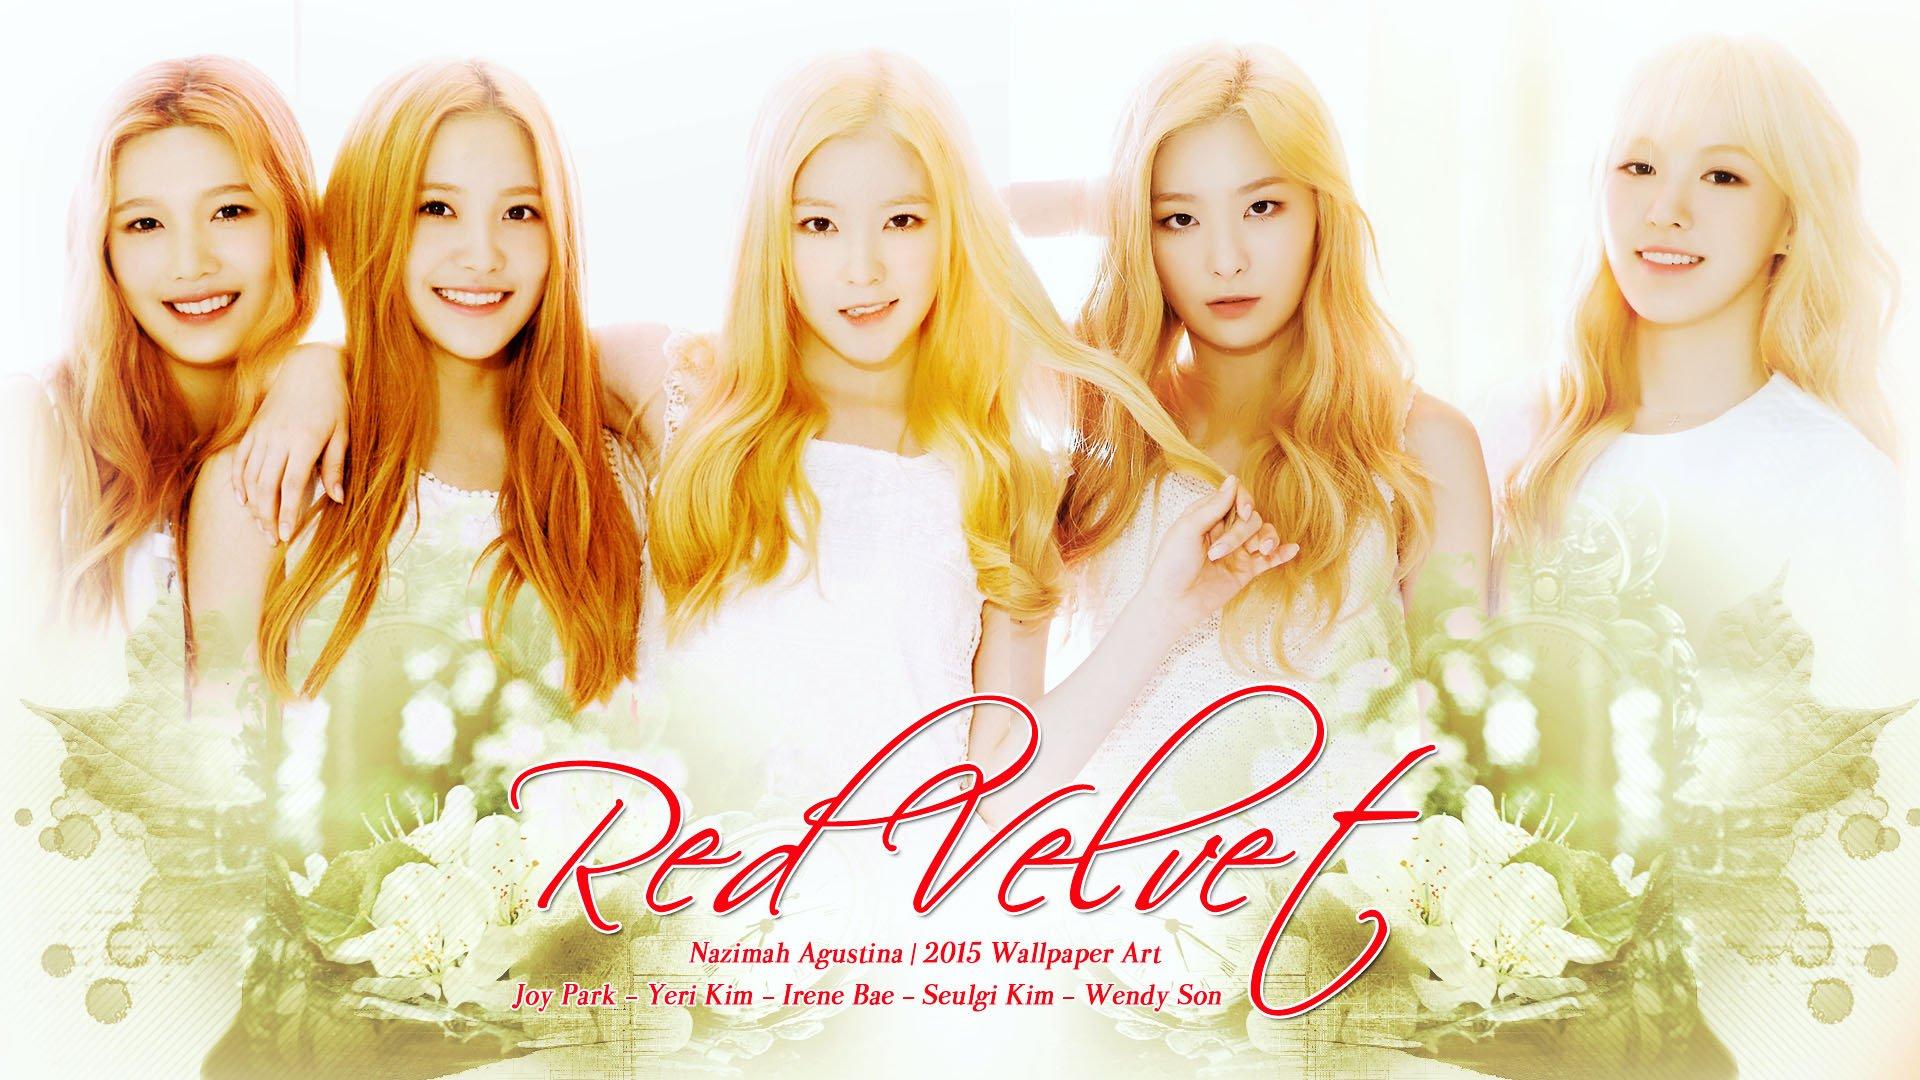 Girl Power K Pop Images Red Velvet Hd Fond D Ecran And Background